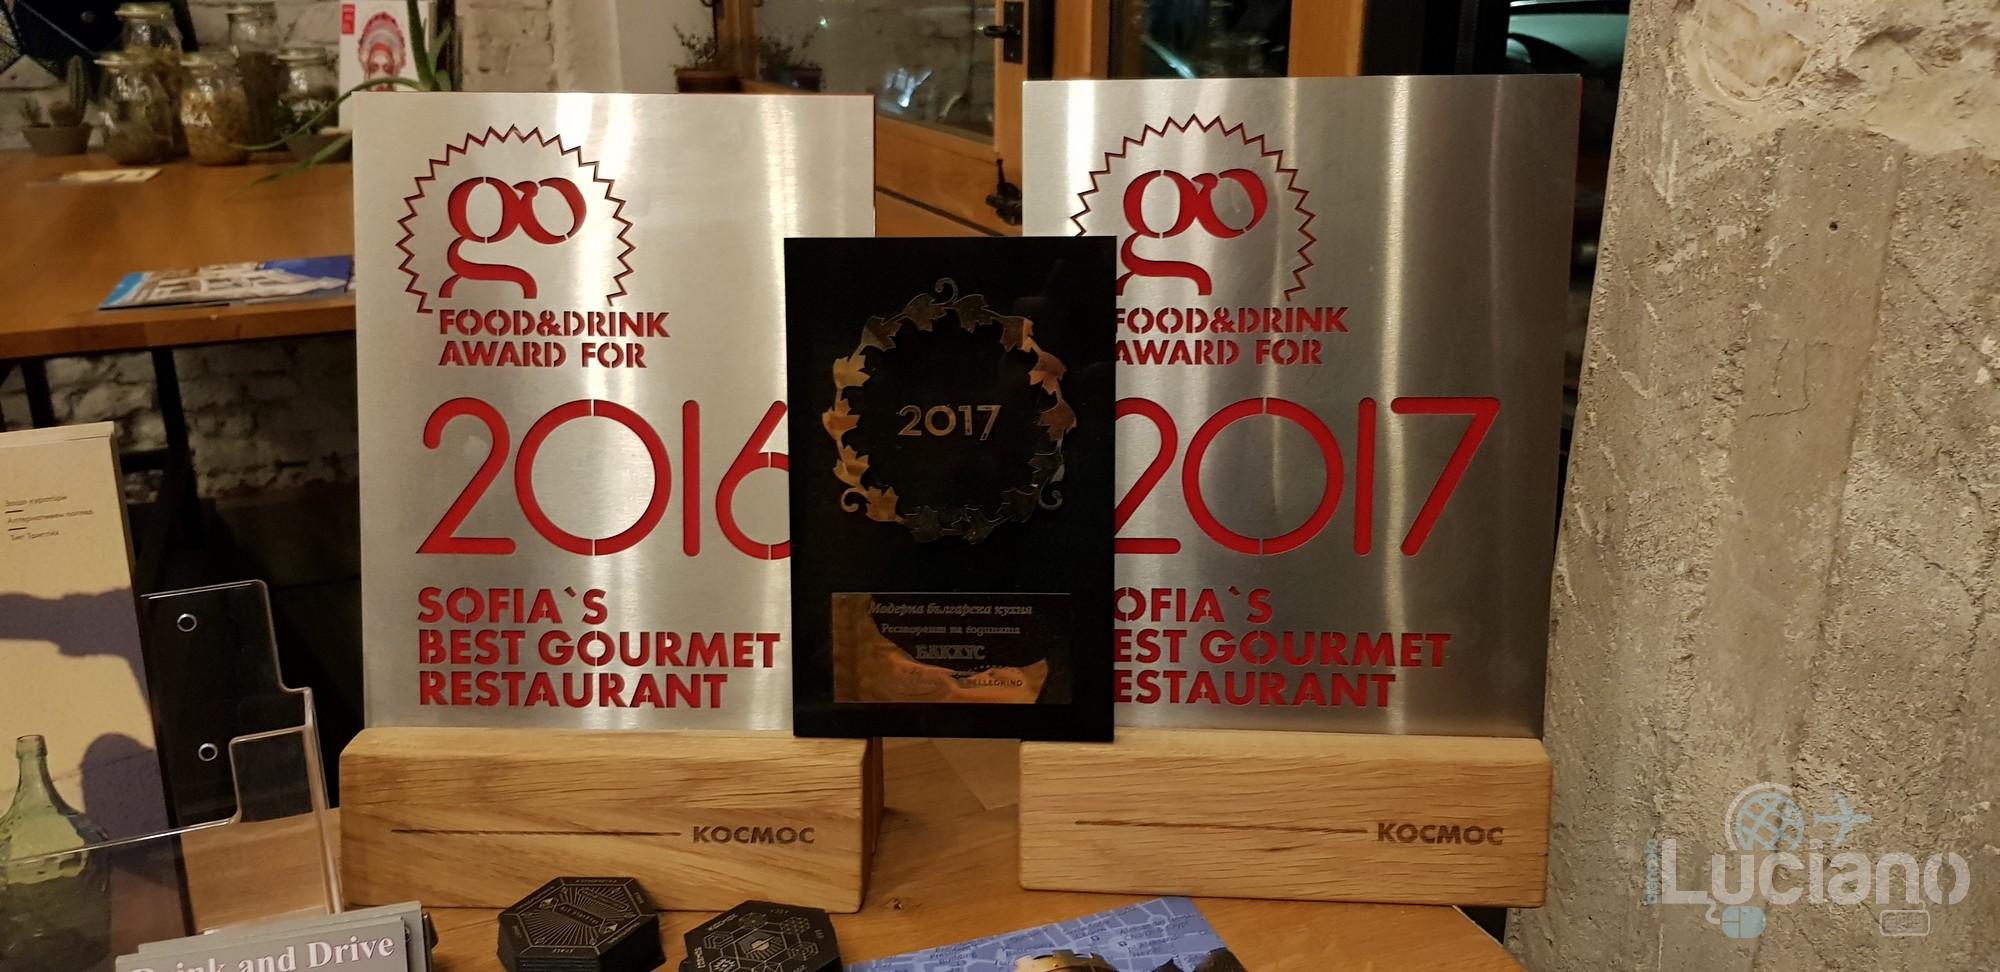 Food & Drink Award fo 2016 and 2017 - sofia best gourmet restaurant - Космос-Cosmos di Sofia - Bulgaria